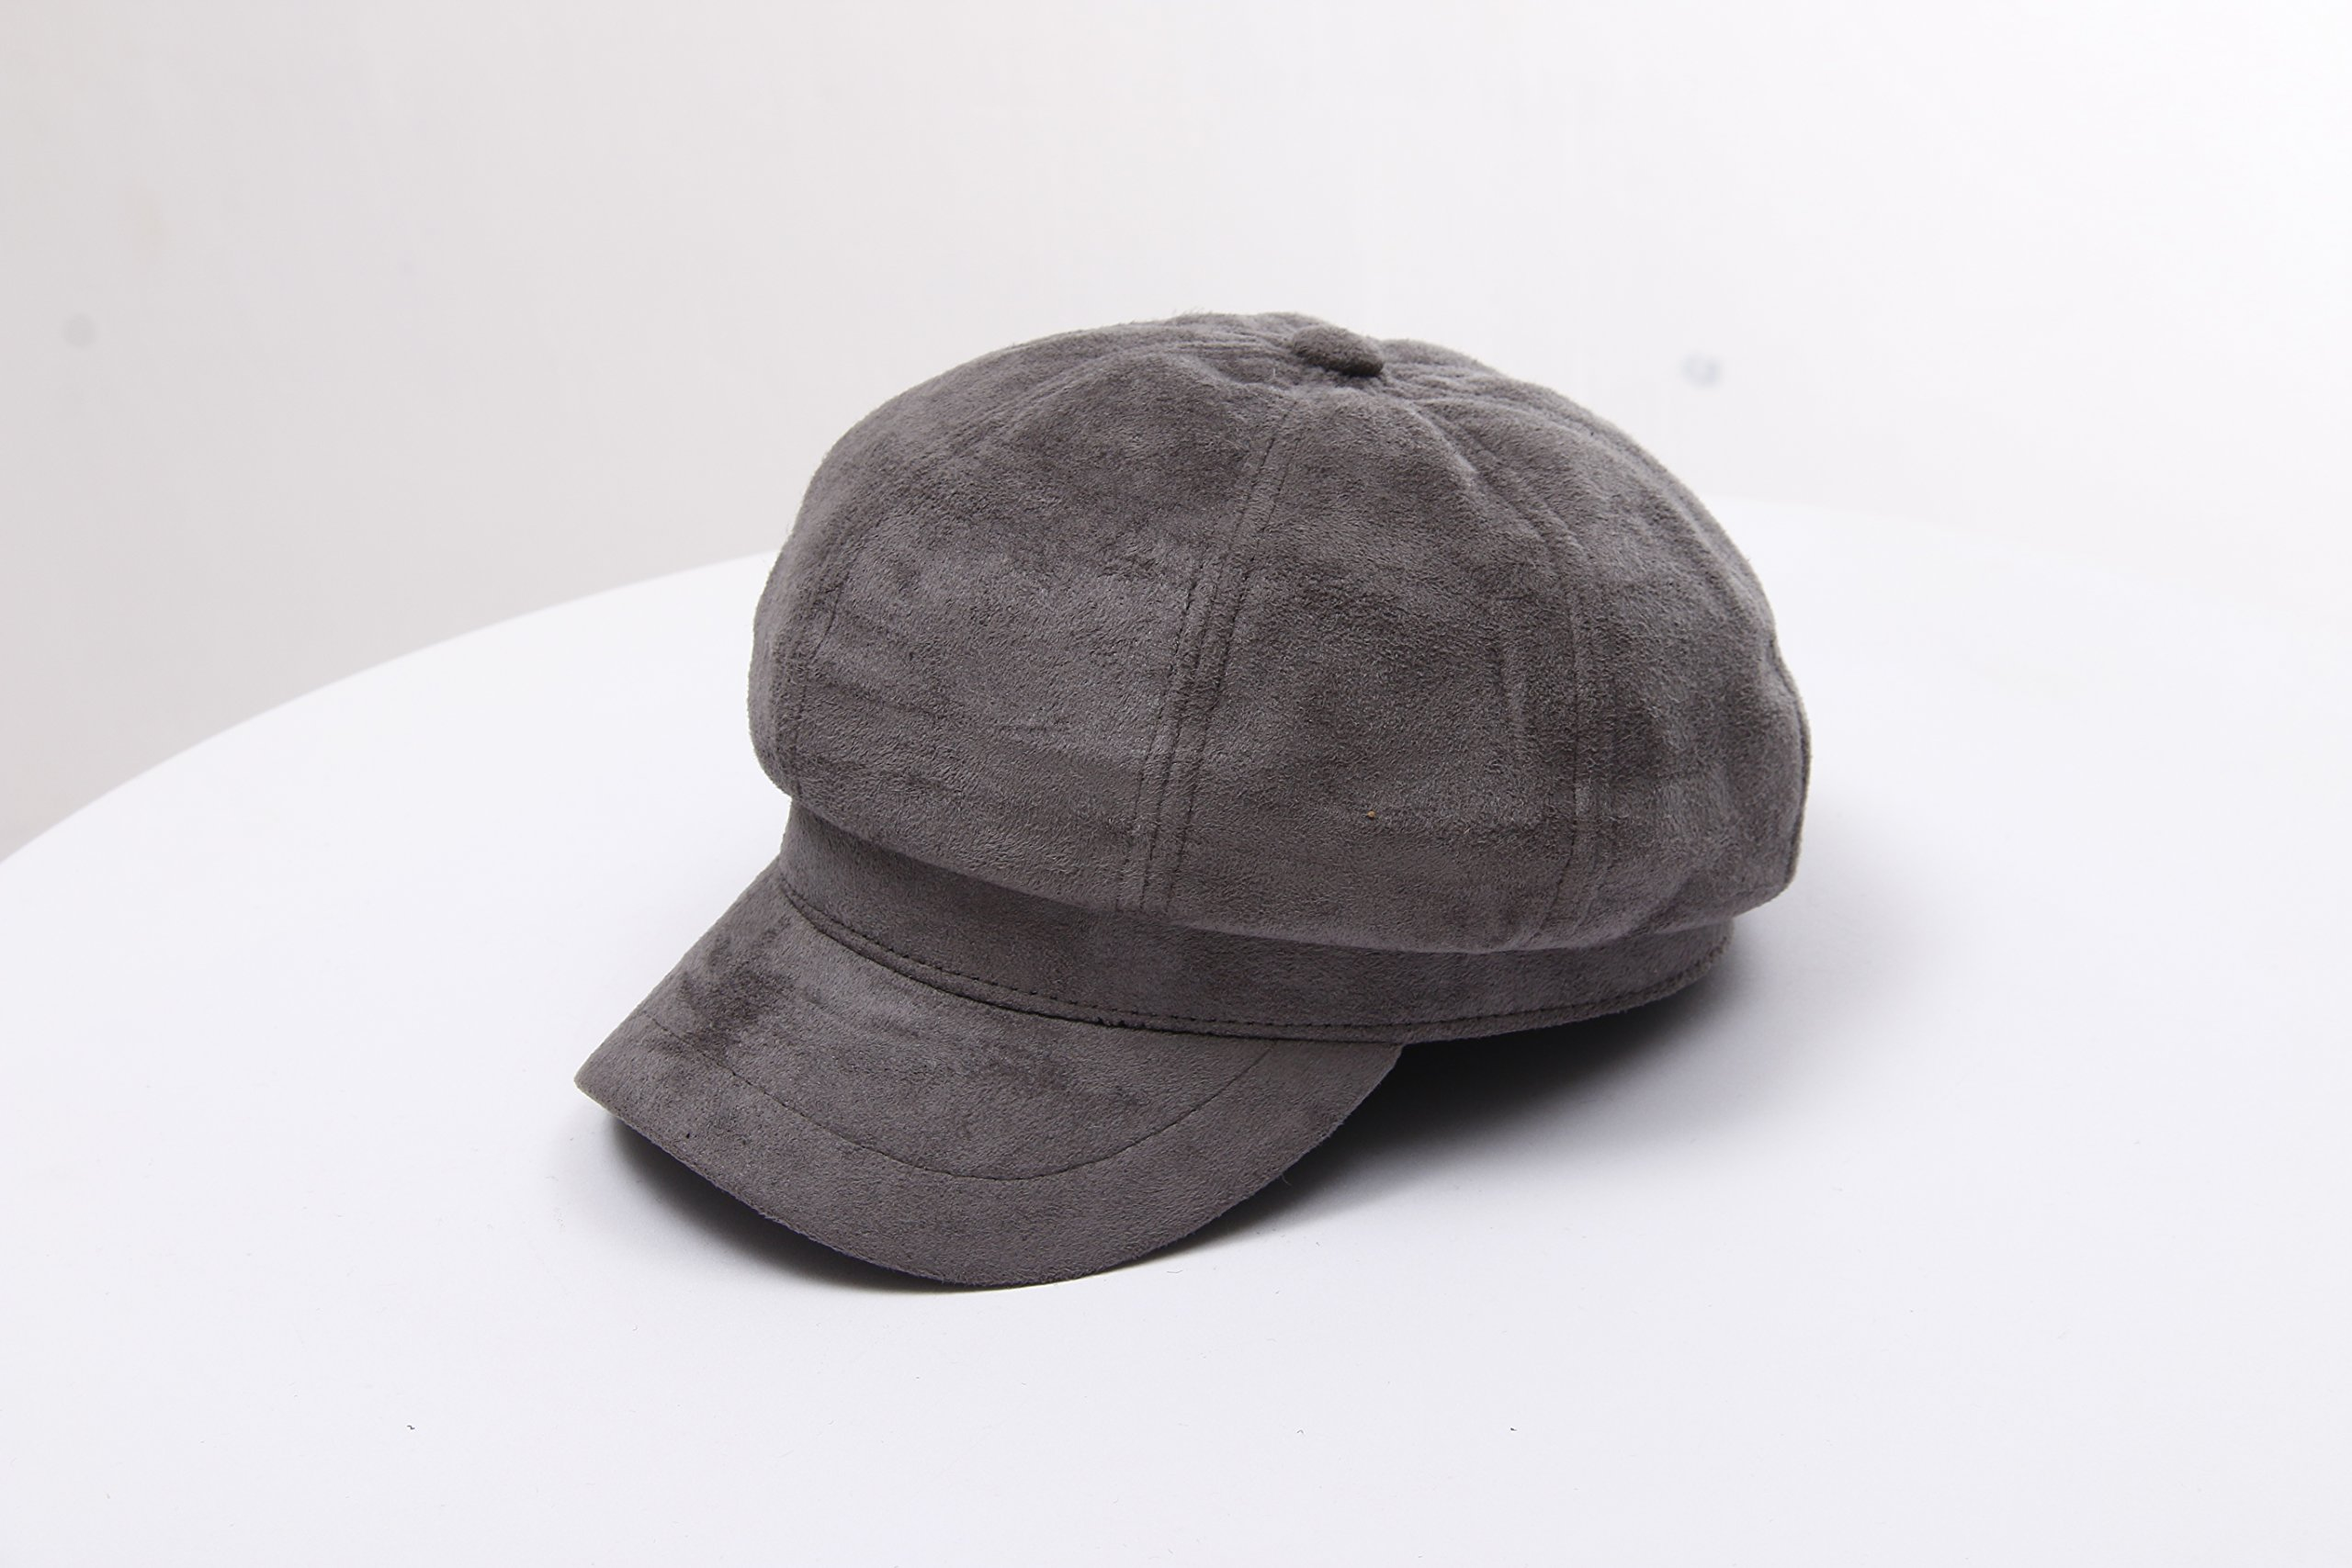 Santiagoana Women Corduroy,Cotton Newsboy Cap Cabbie Painter Beret Cloche Cotton Visor Hats (Grey) by Santiagoana (Image #3)